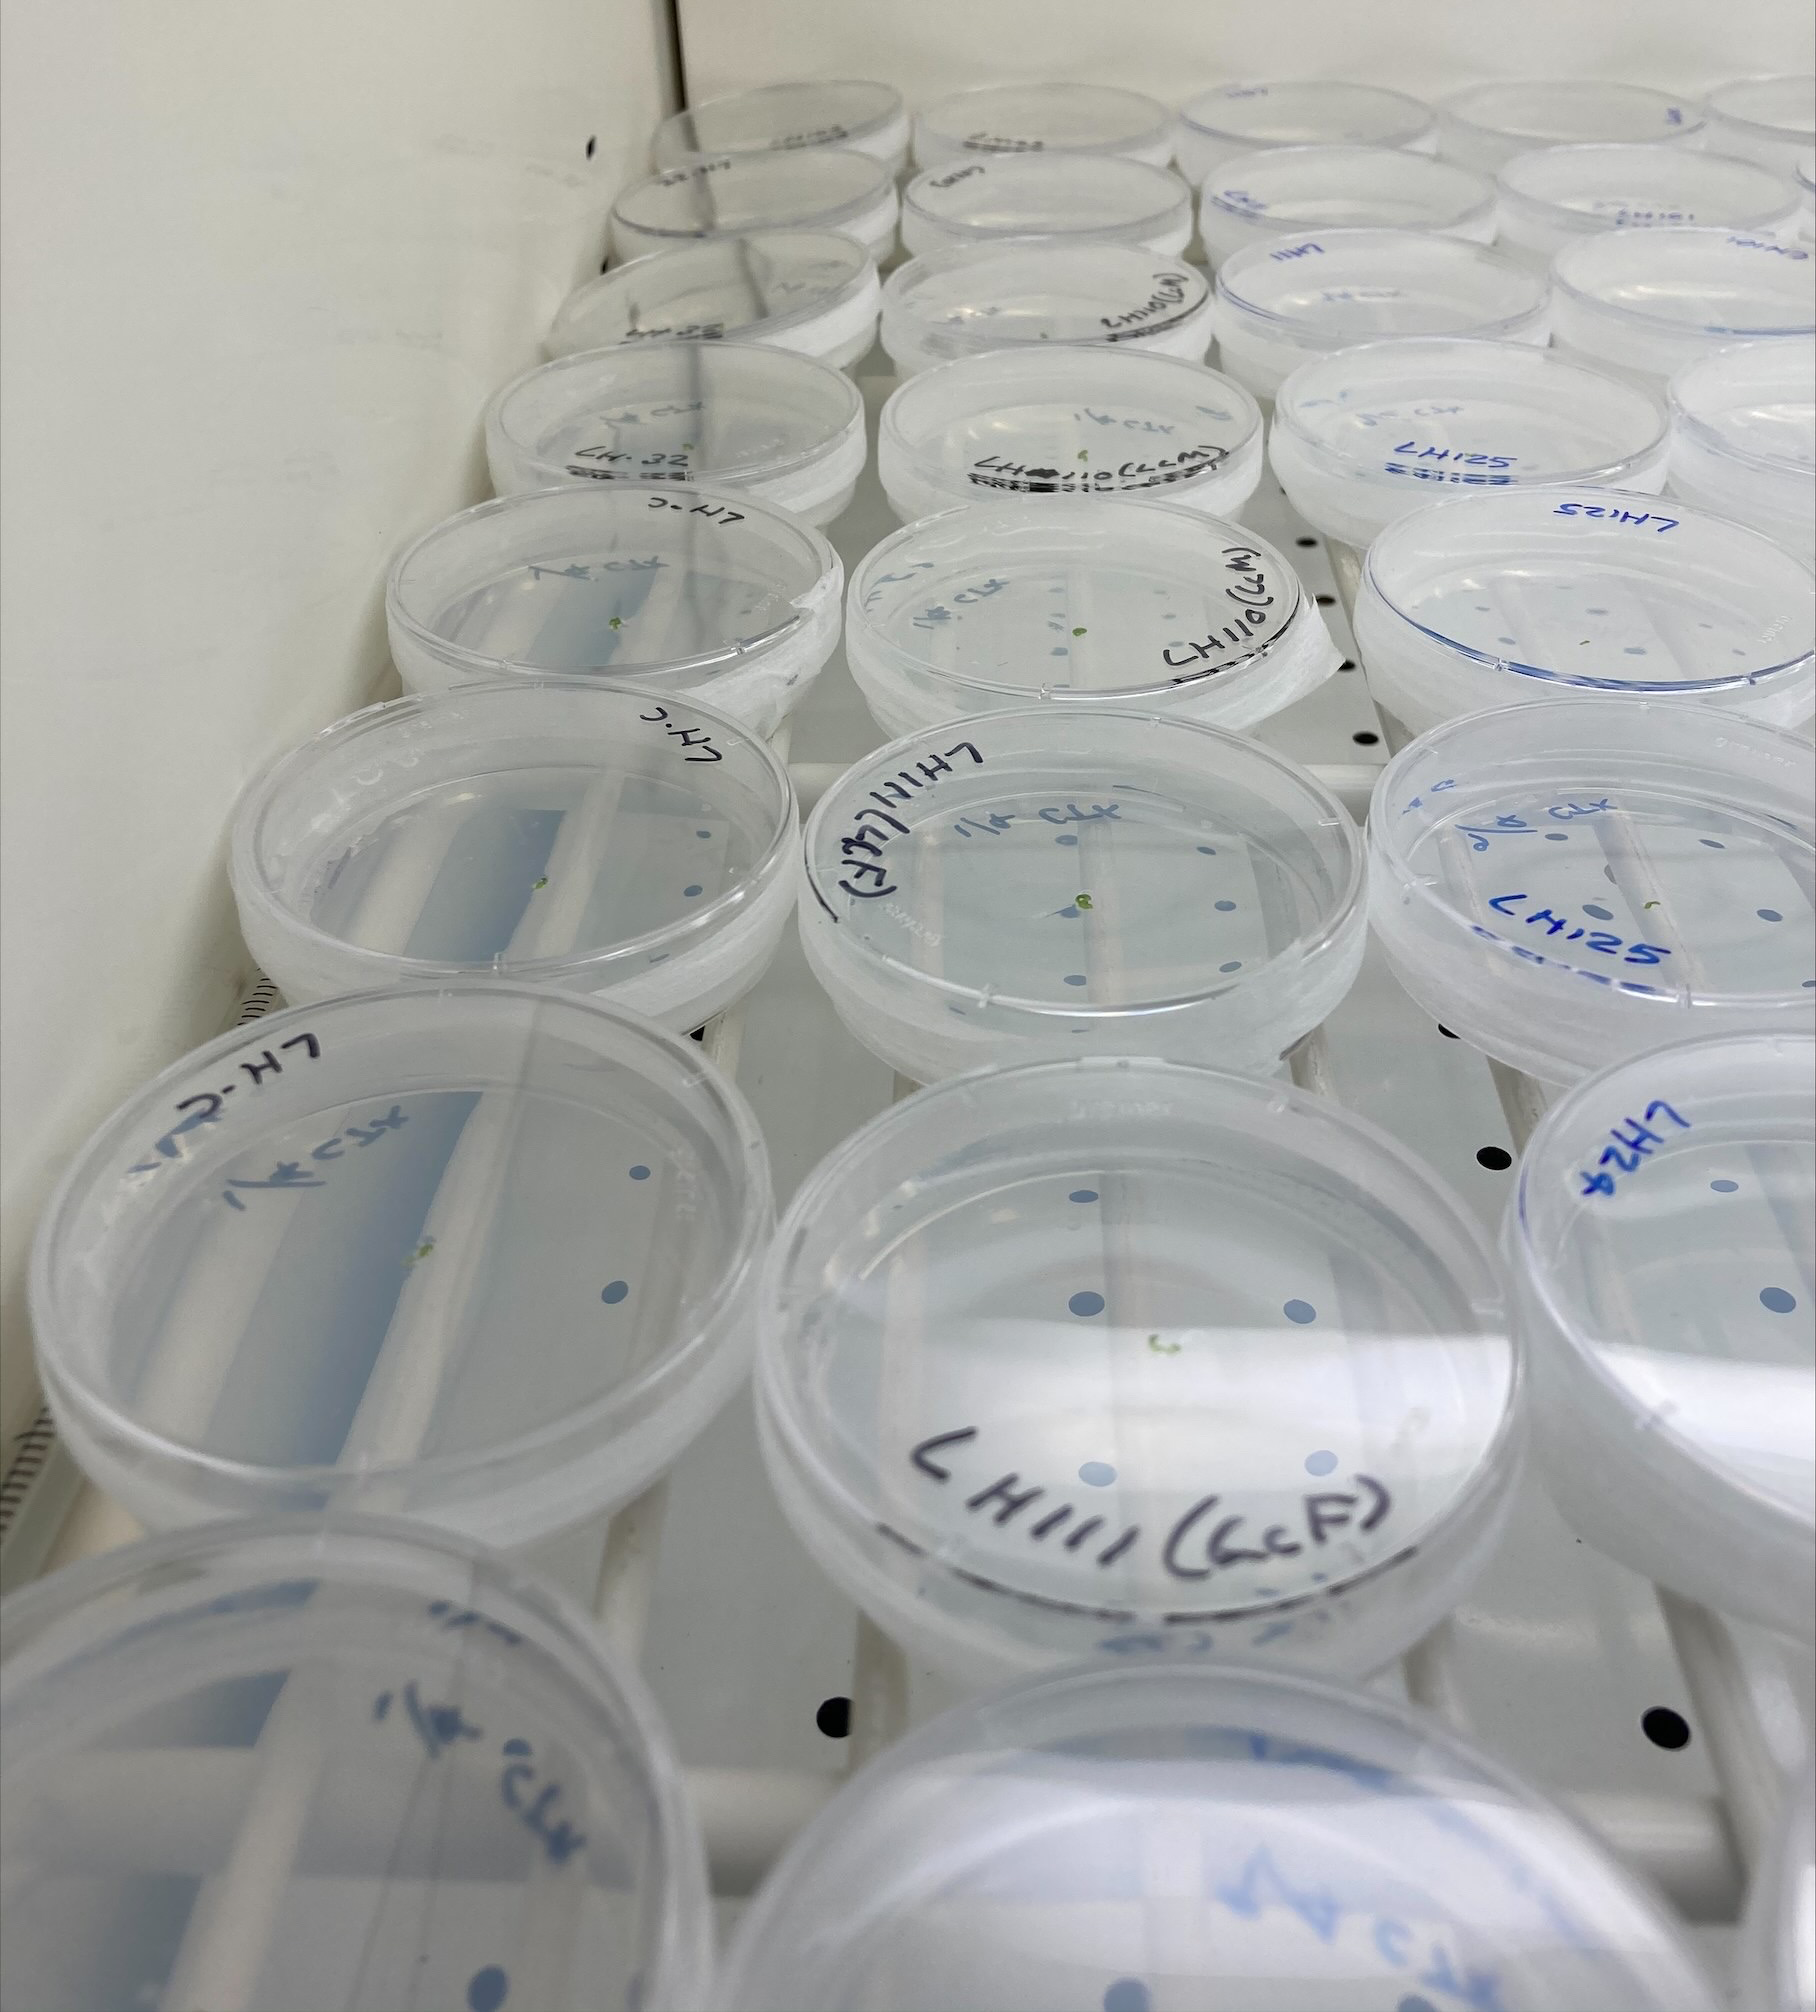 Multiple plates of gemmae developing into liverwort plants